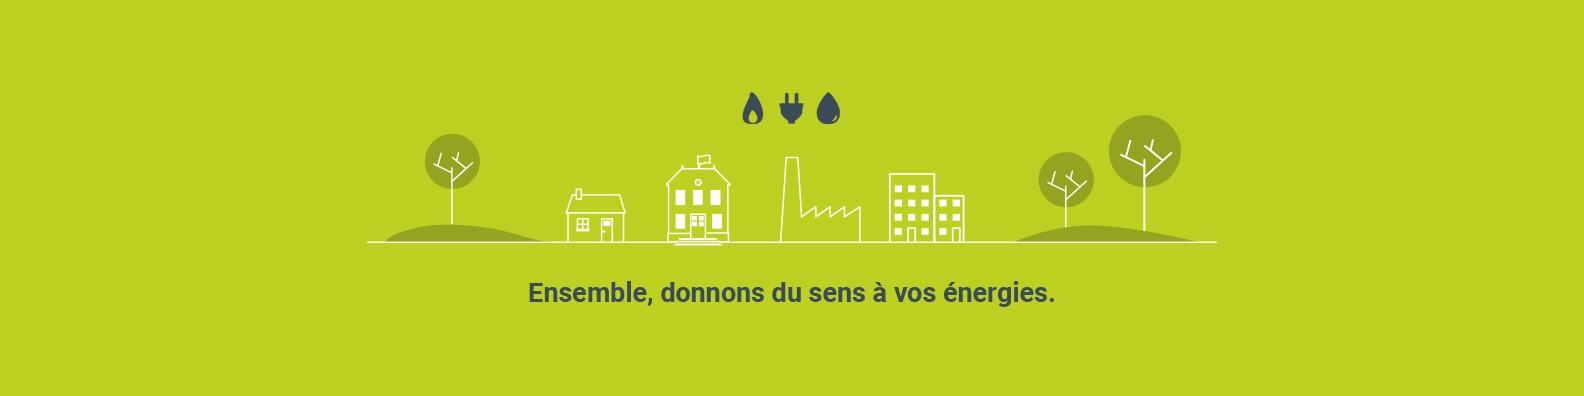 Eco Co2 Linkedin